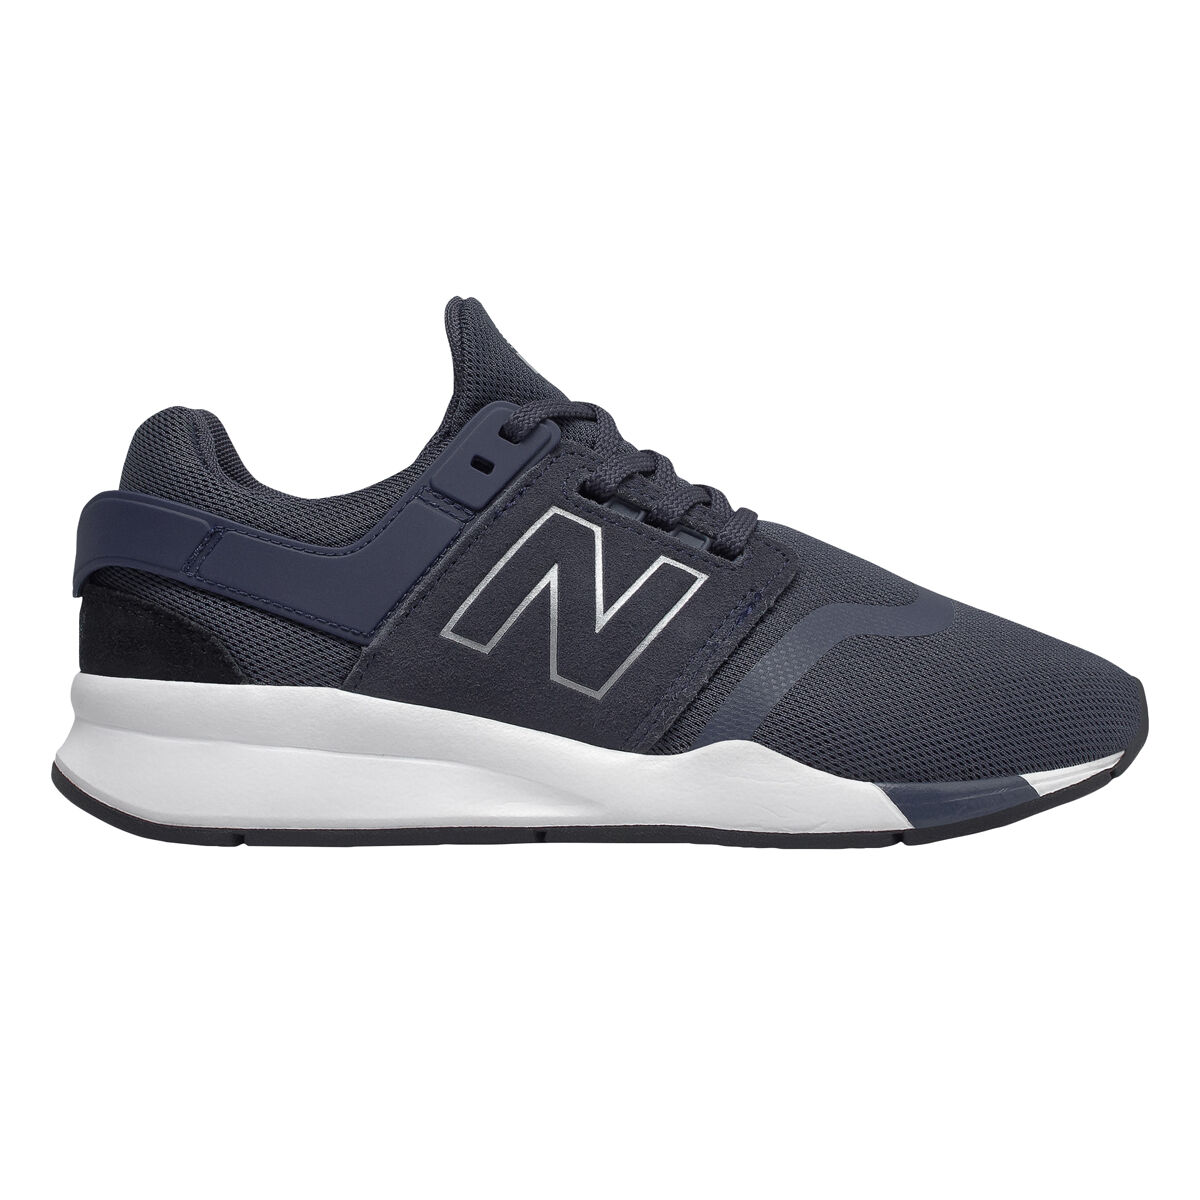 New Balance 247 v2 Kids Casual Shoes